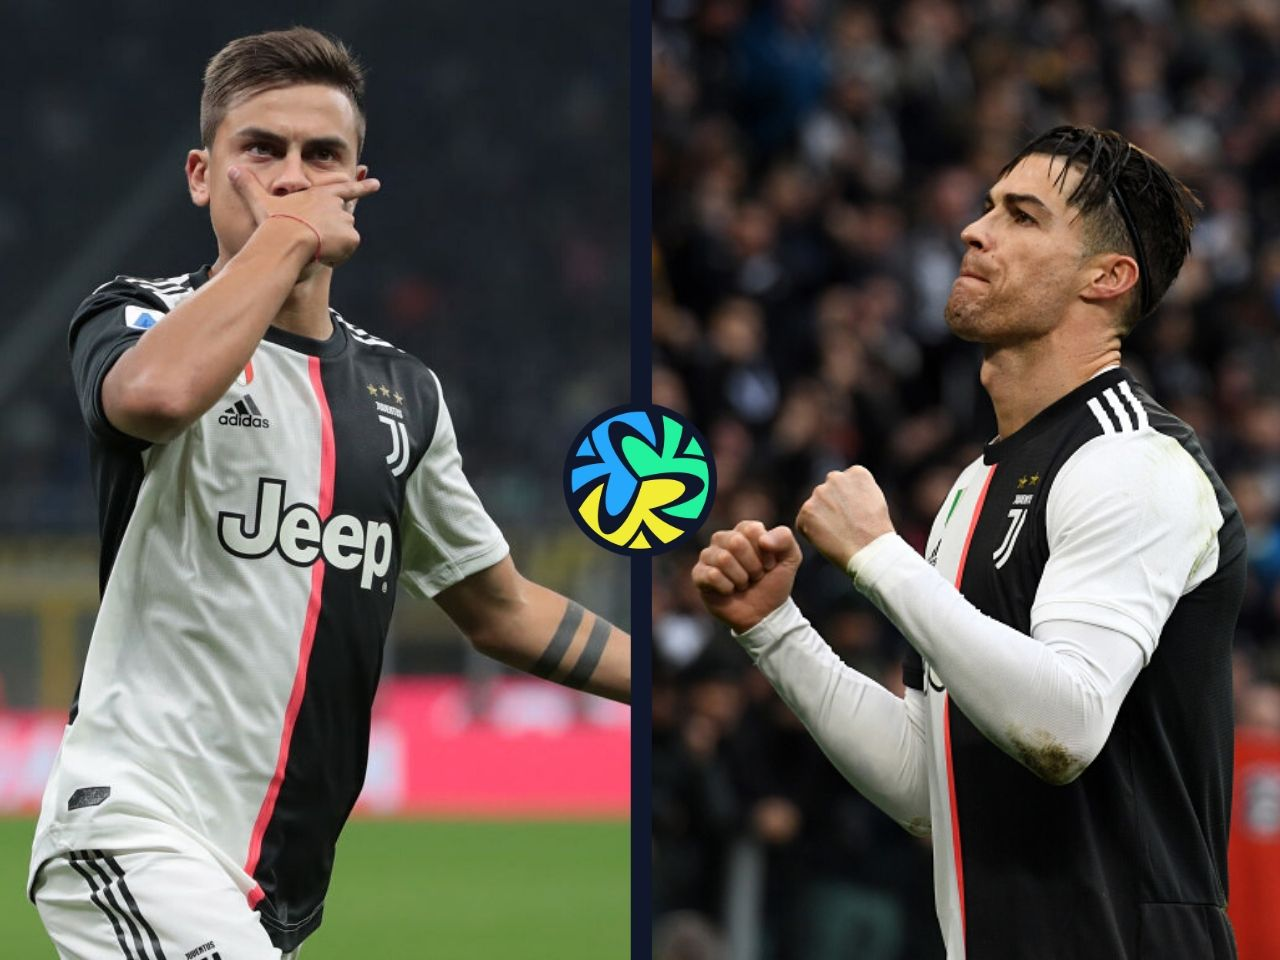 Sampdoria, Juventus